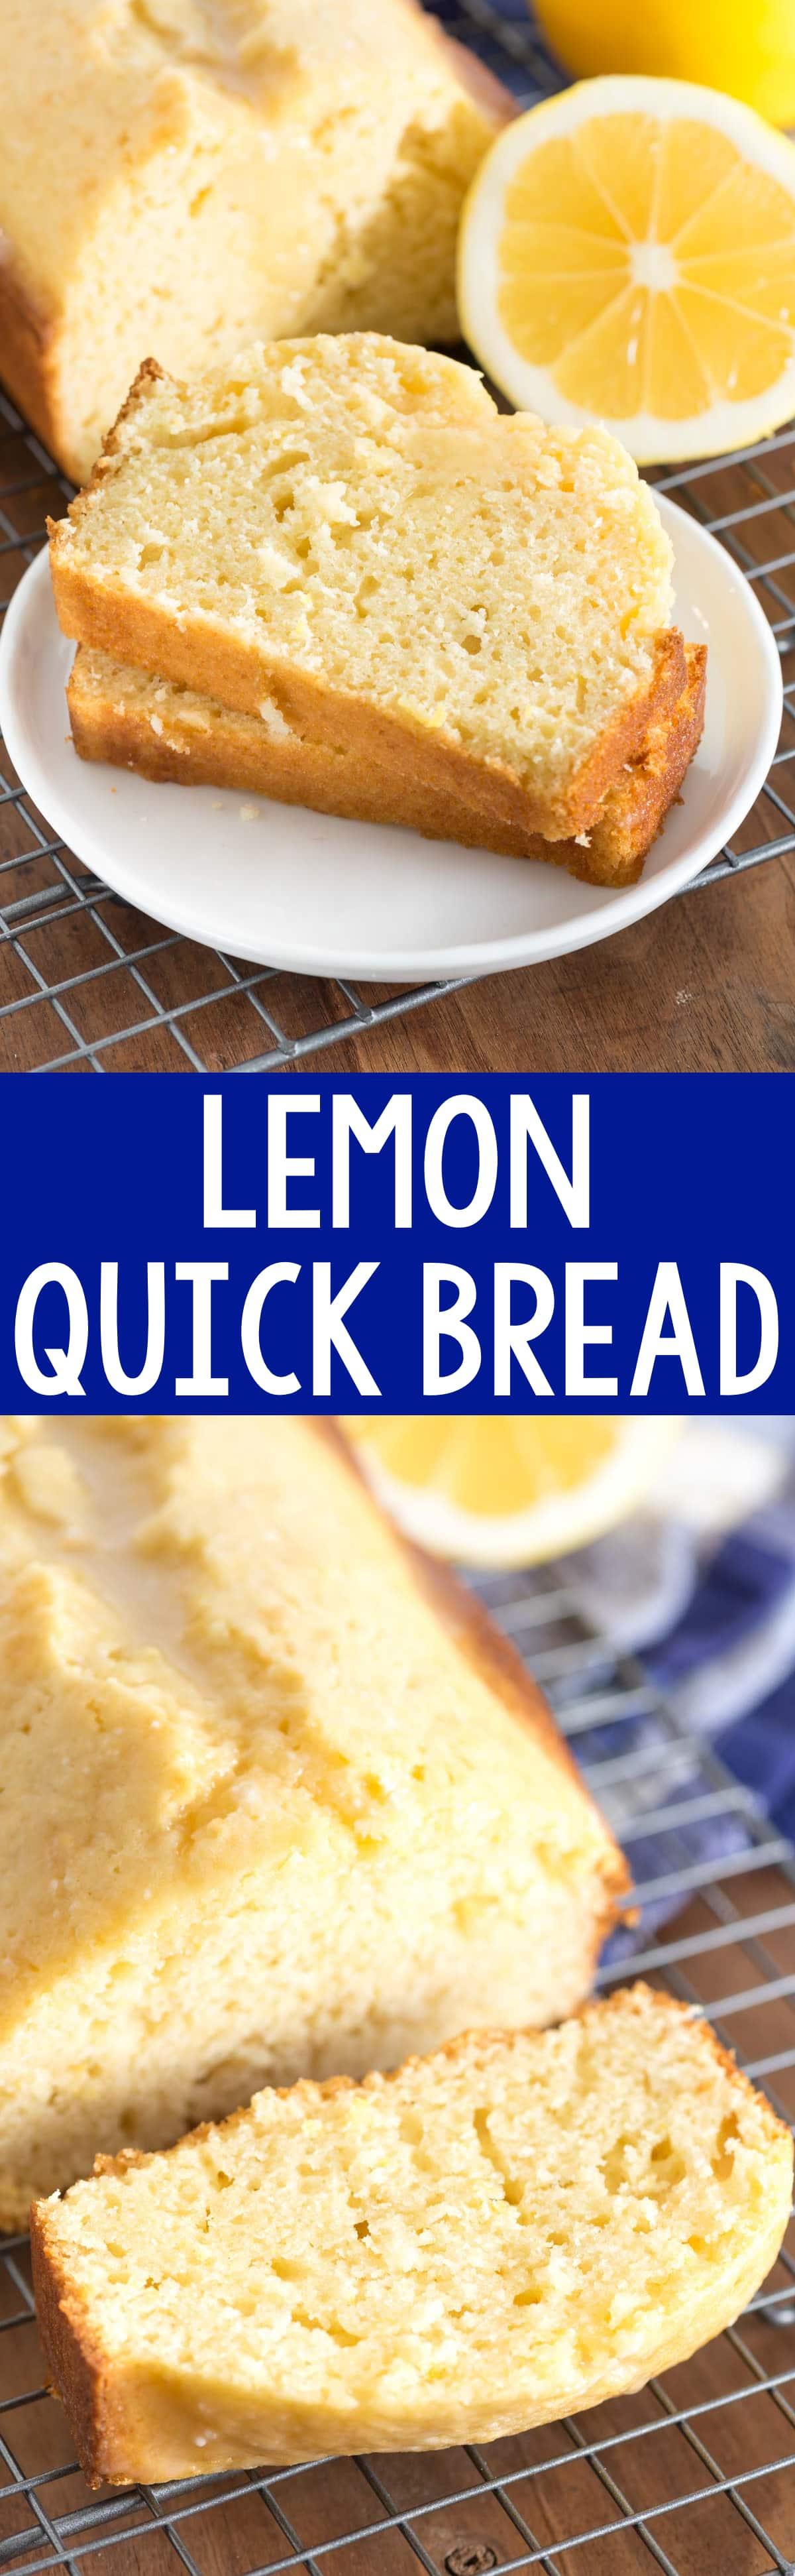 Lemon Quick Bread - Crazy for Crust